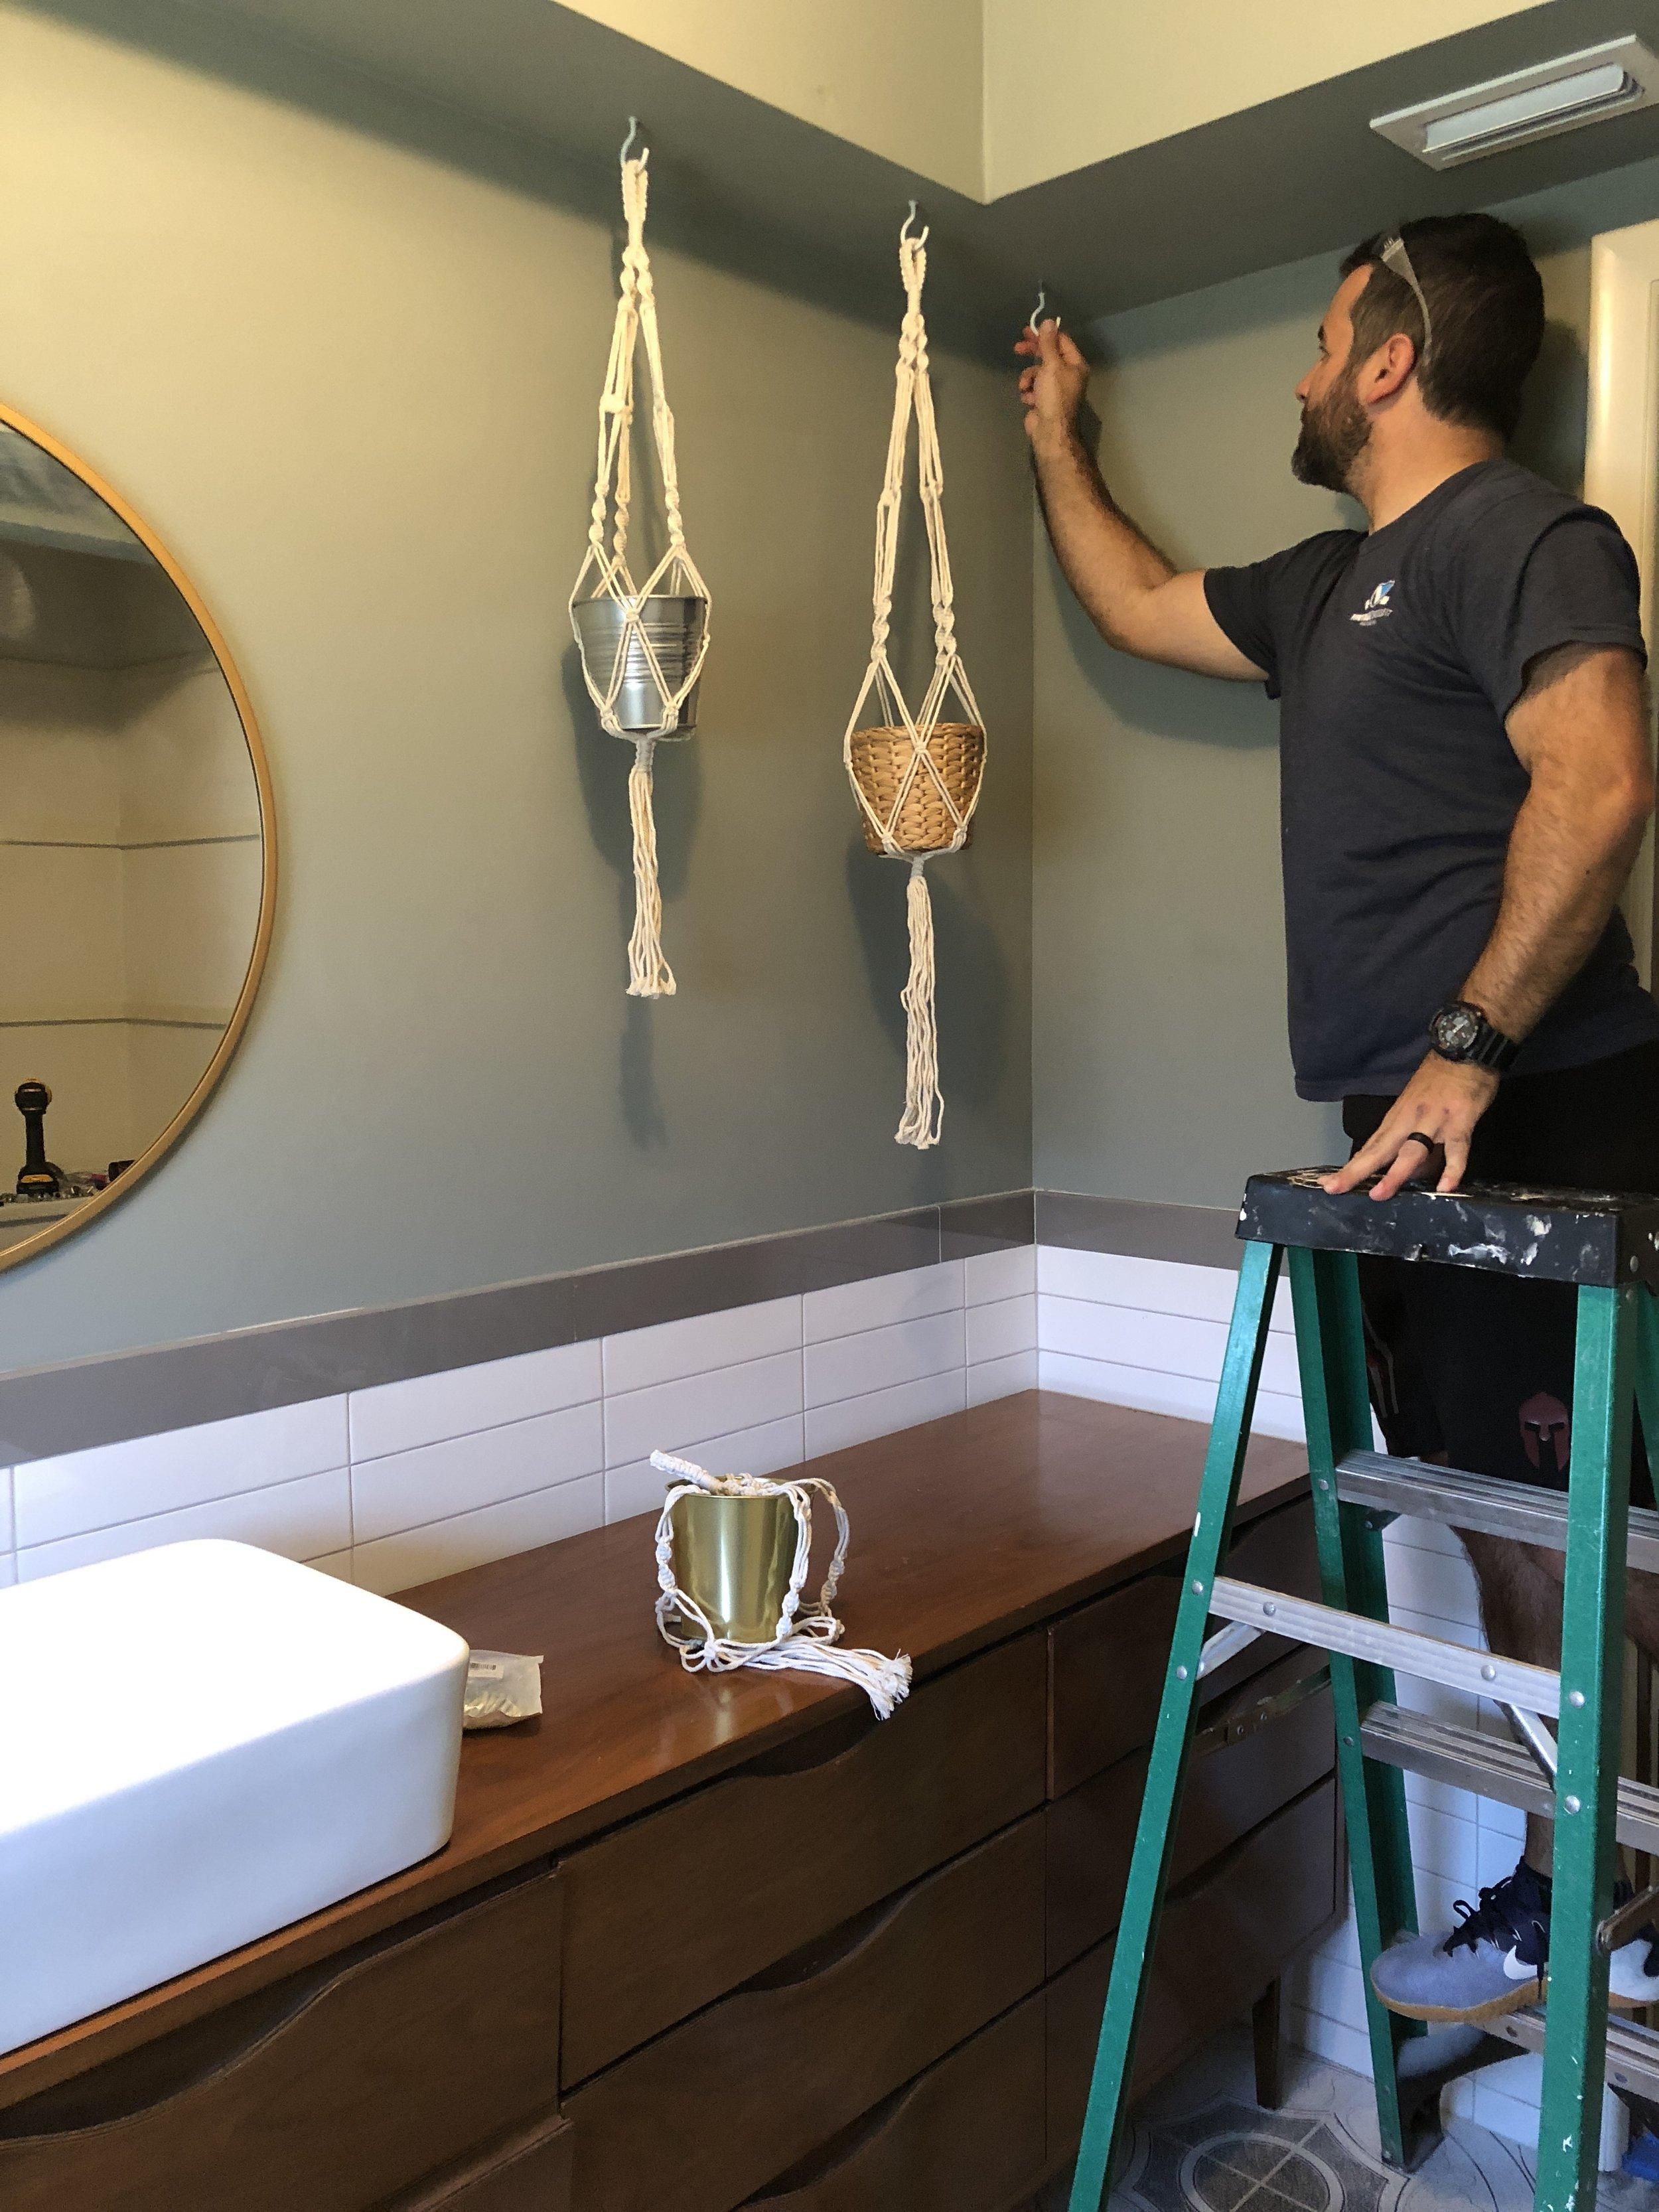 Hanging planters in bathroom